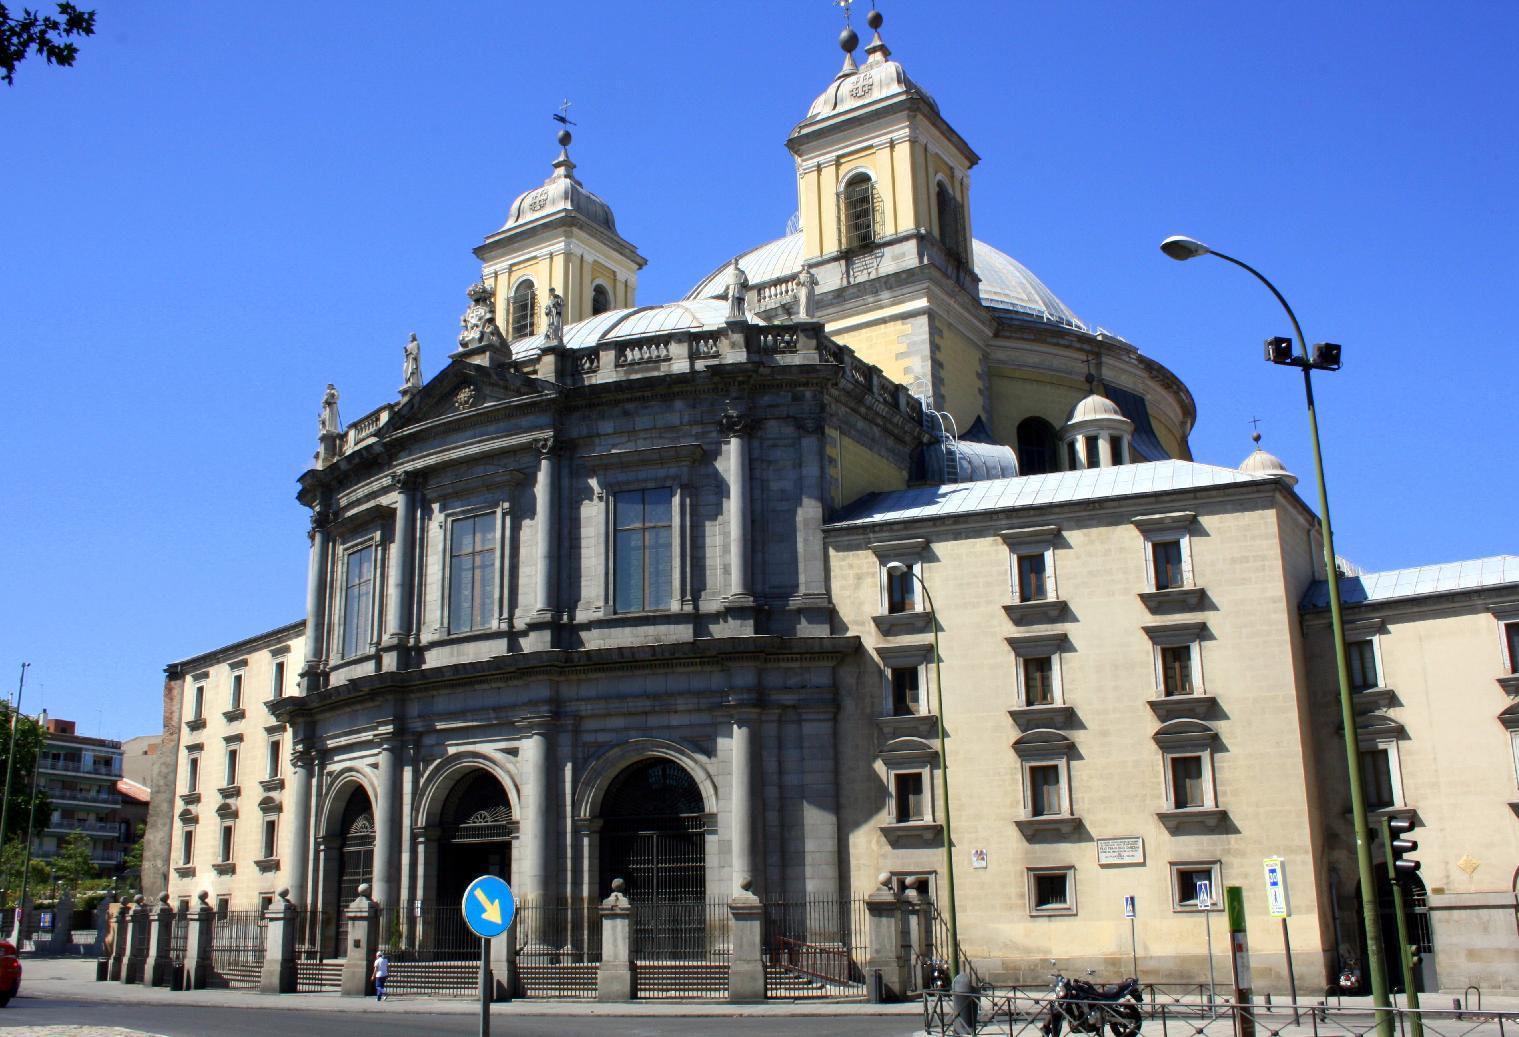 The Basilica of San Francisco